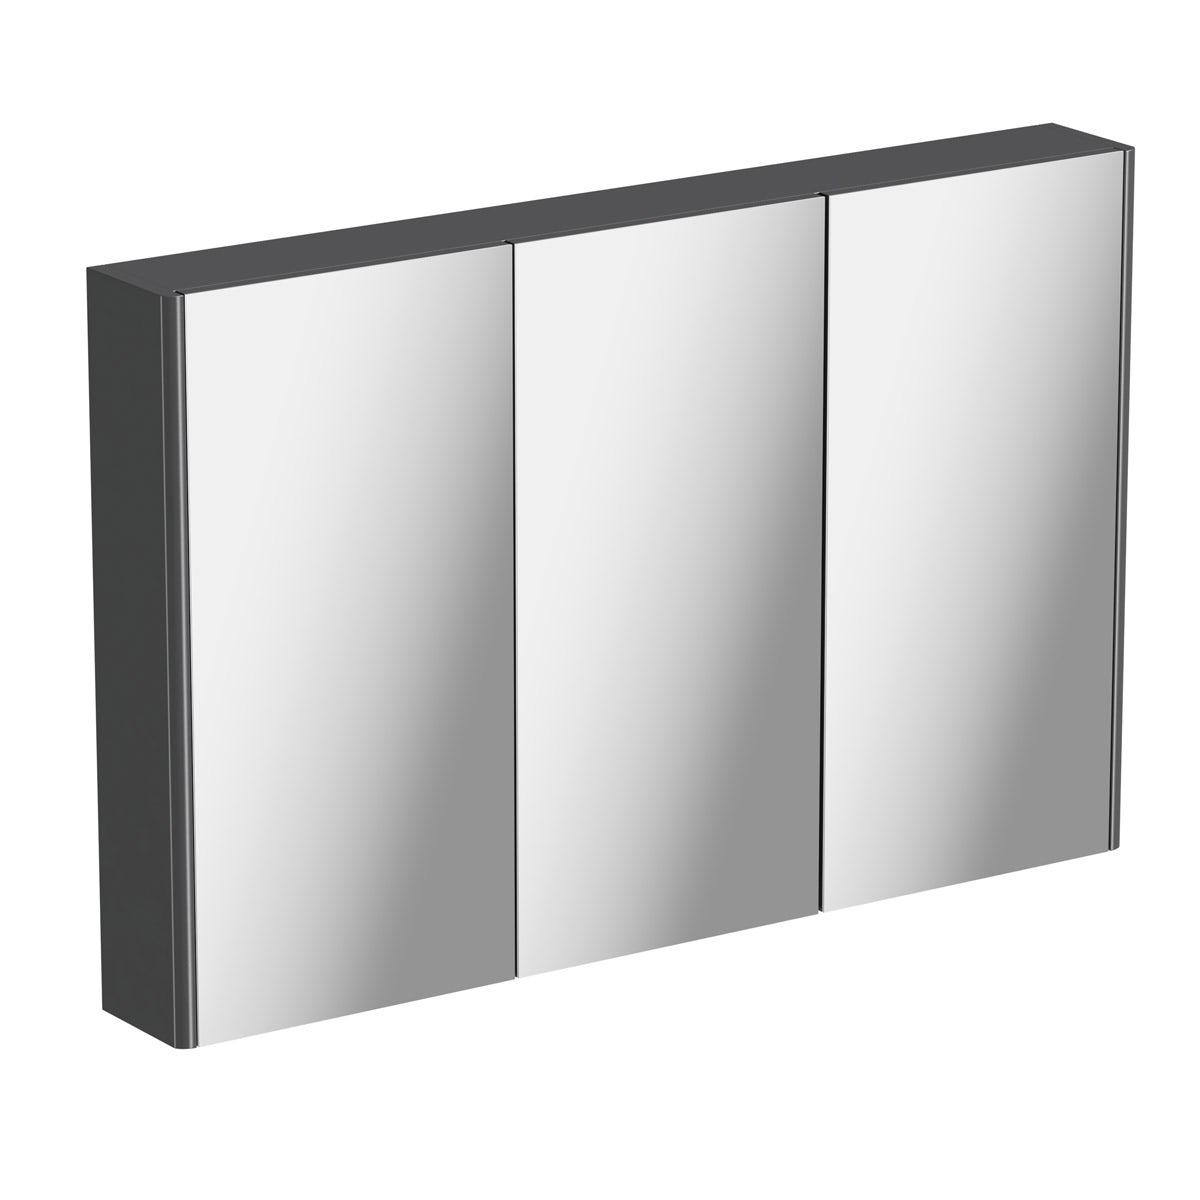 Mode slate gloss grey mirror cabinet 650 x 1000mm